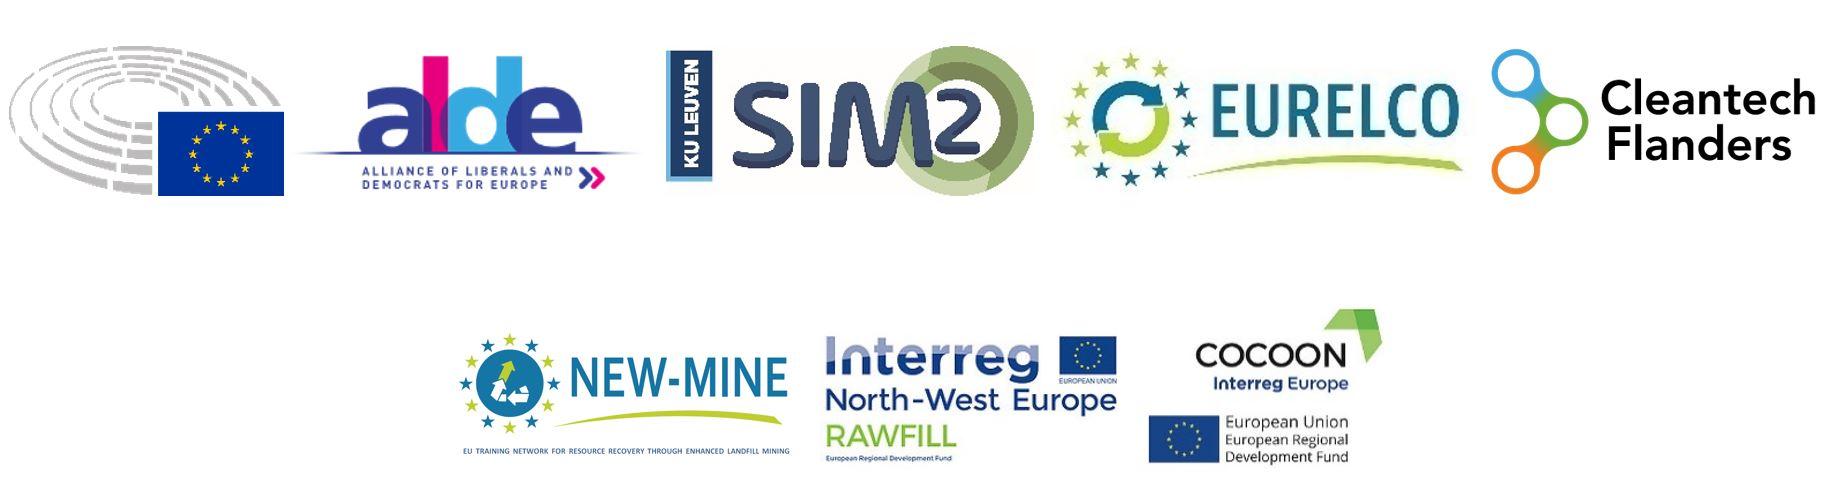 Logos organisers EP event